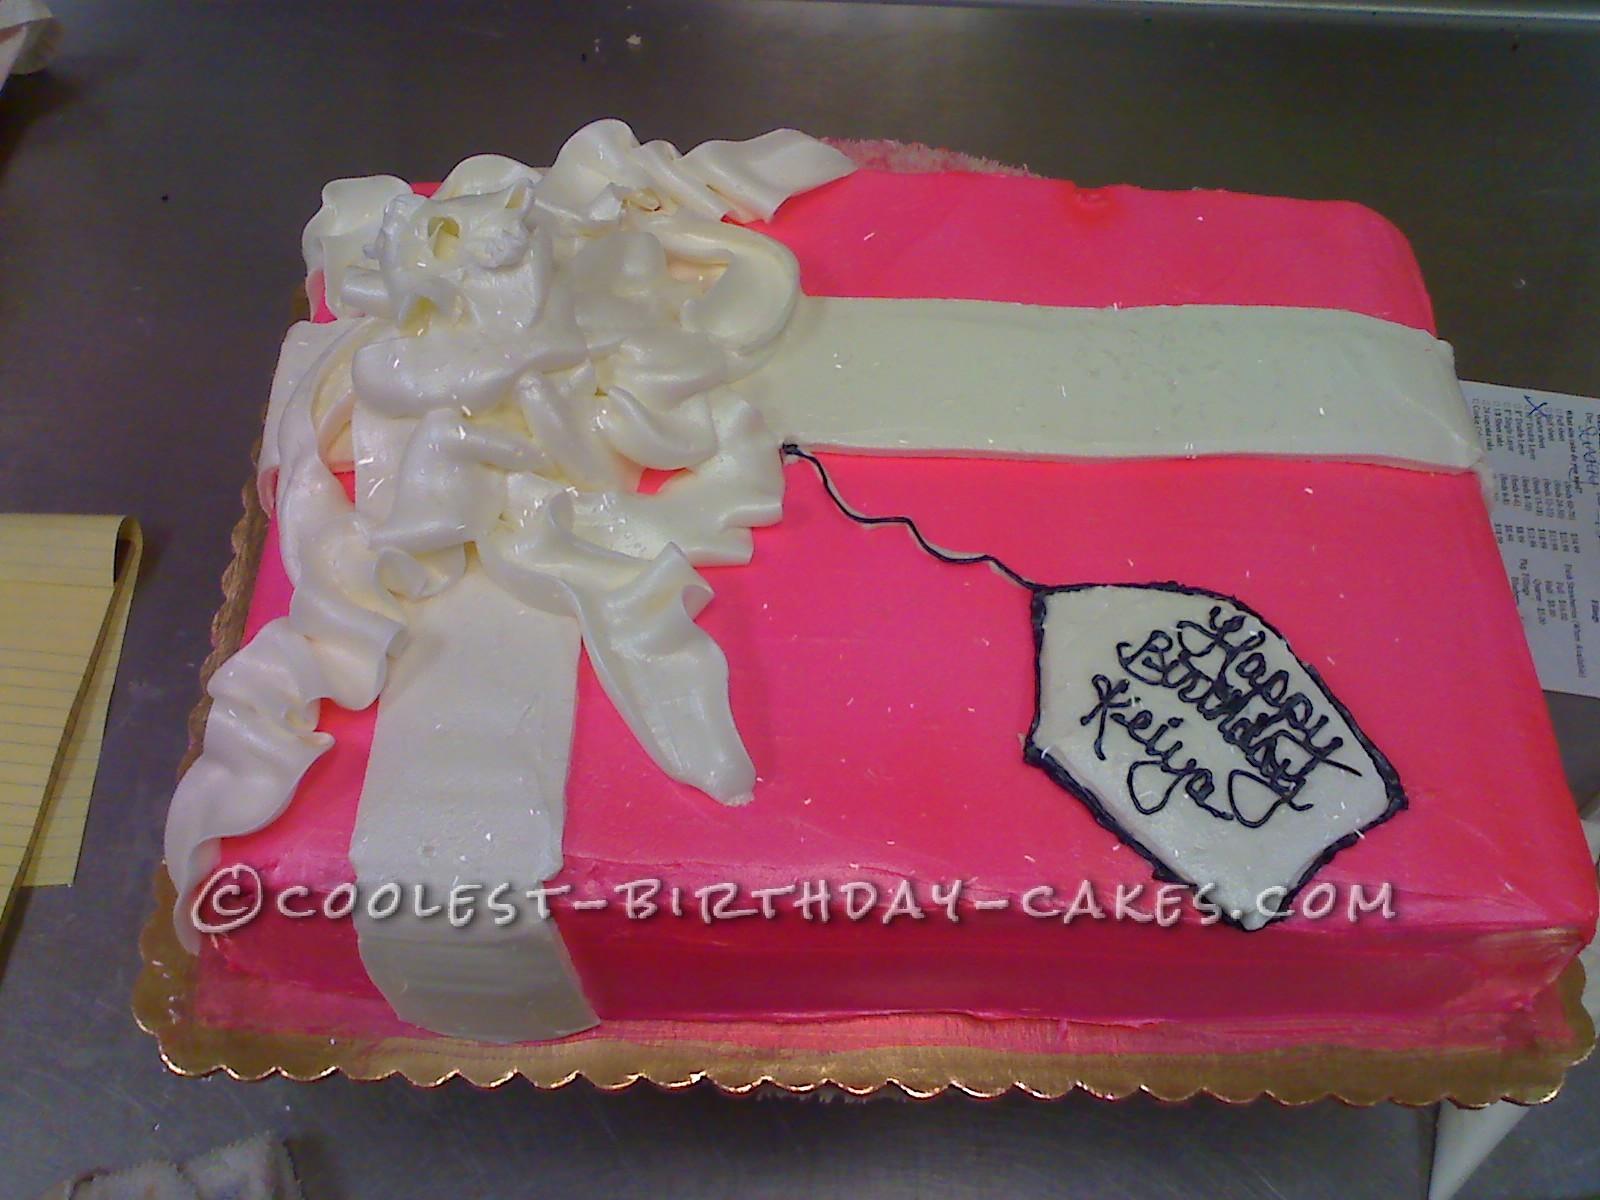 Coolest Present Birthday Cake